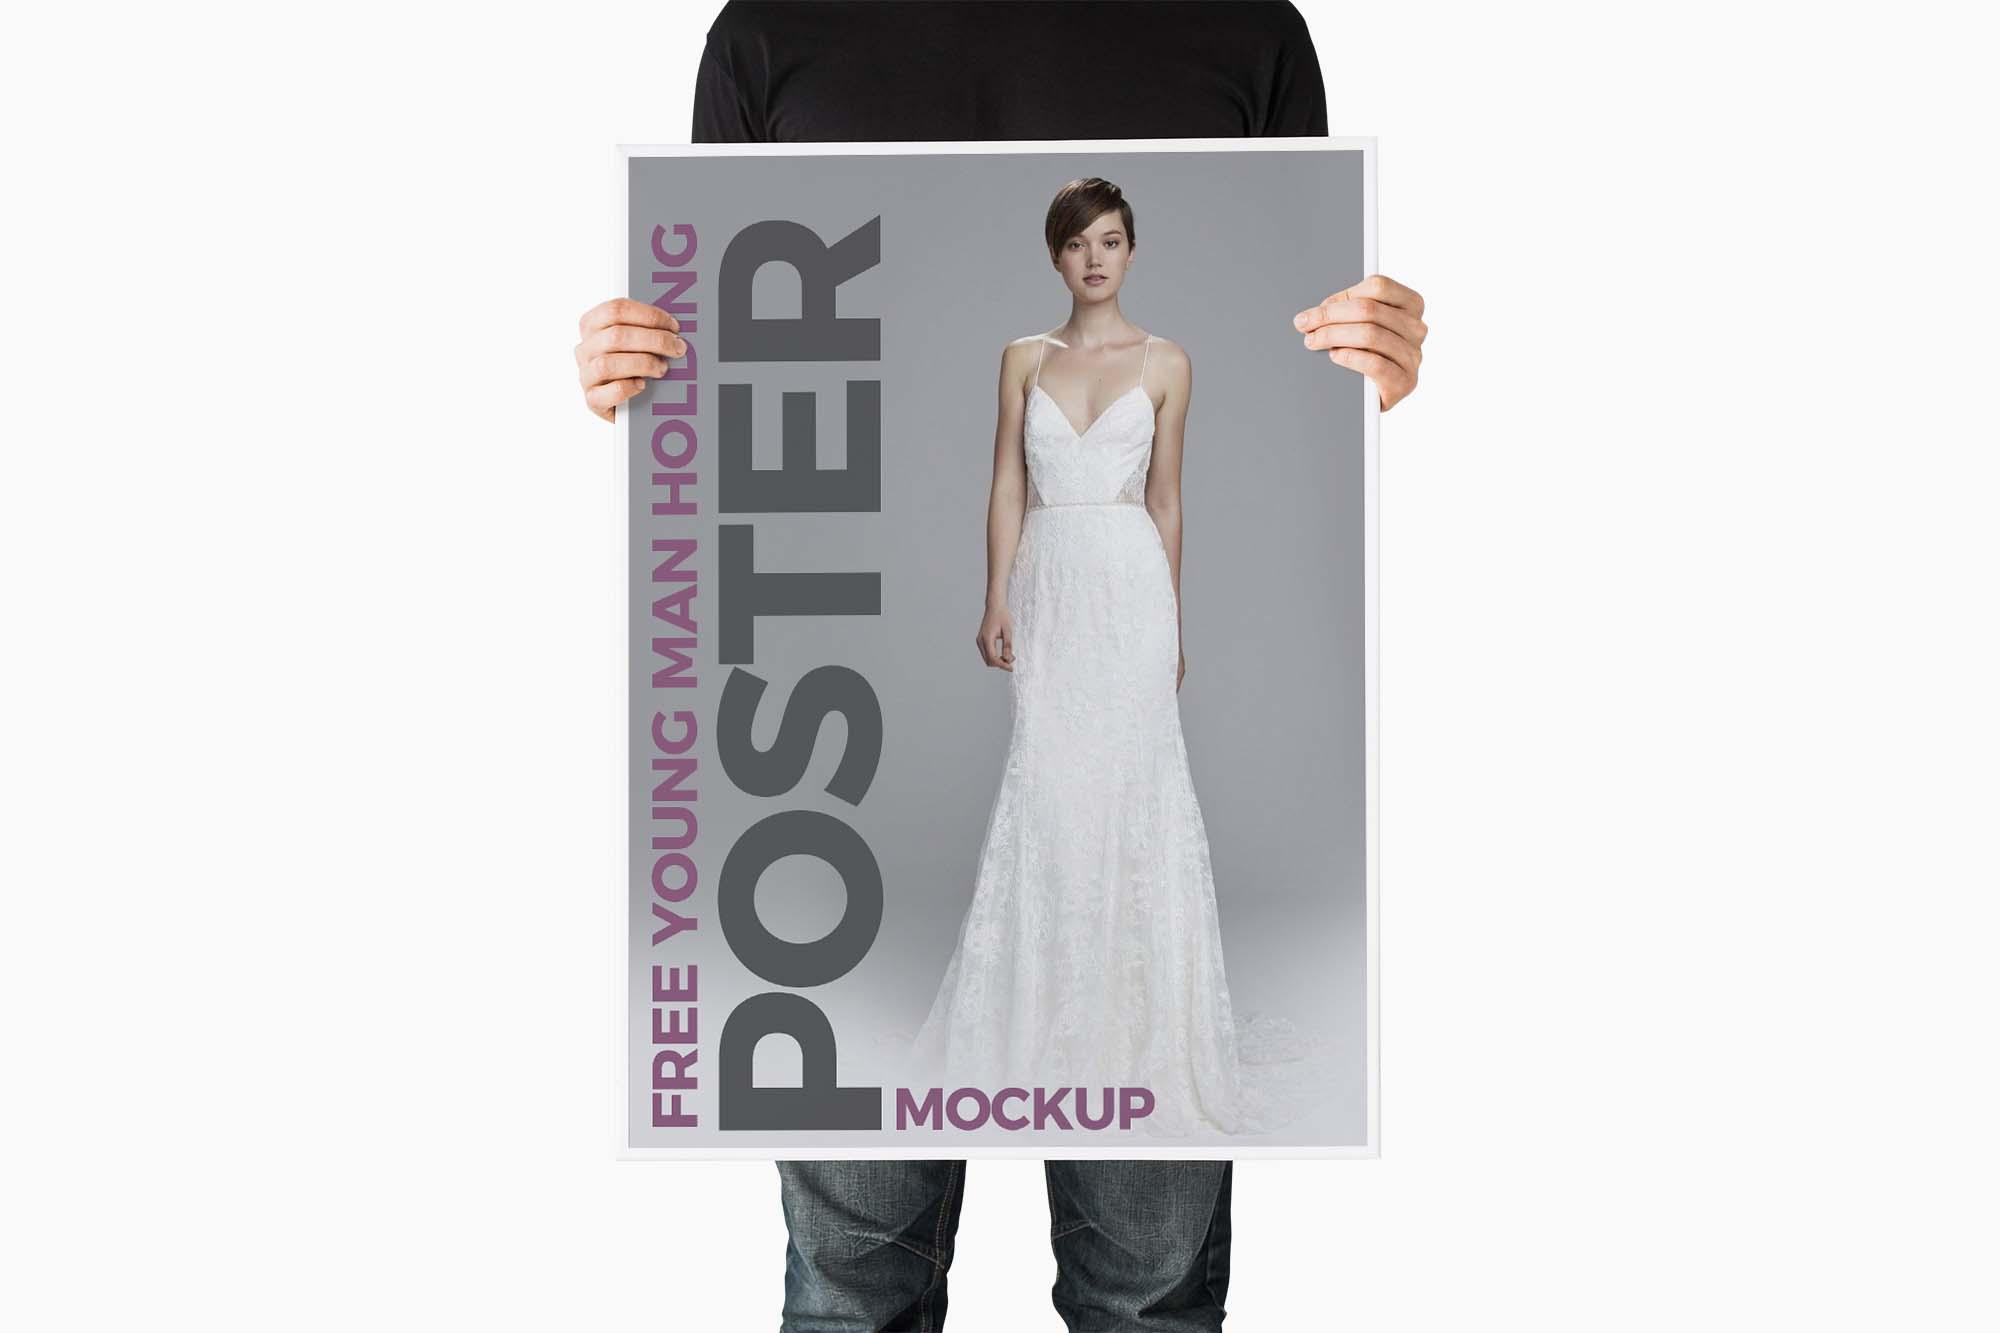 Man Holding Poster Mockup